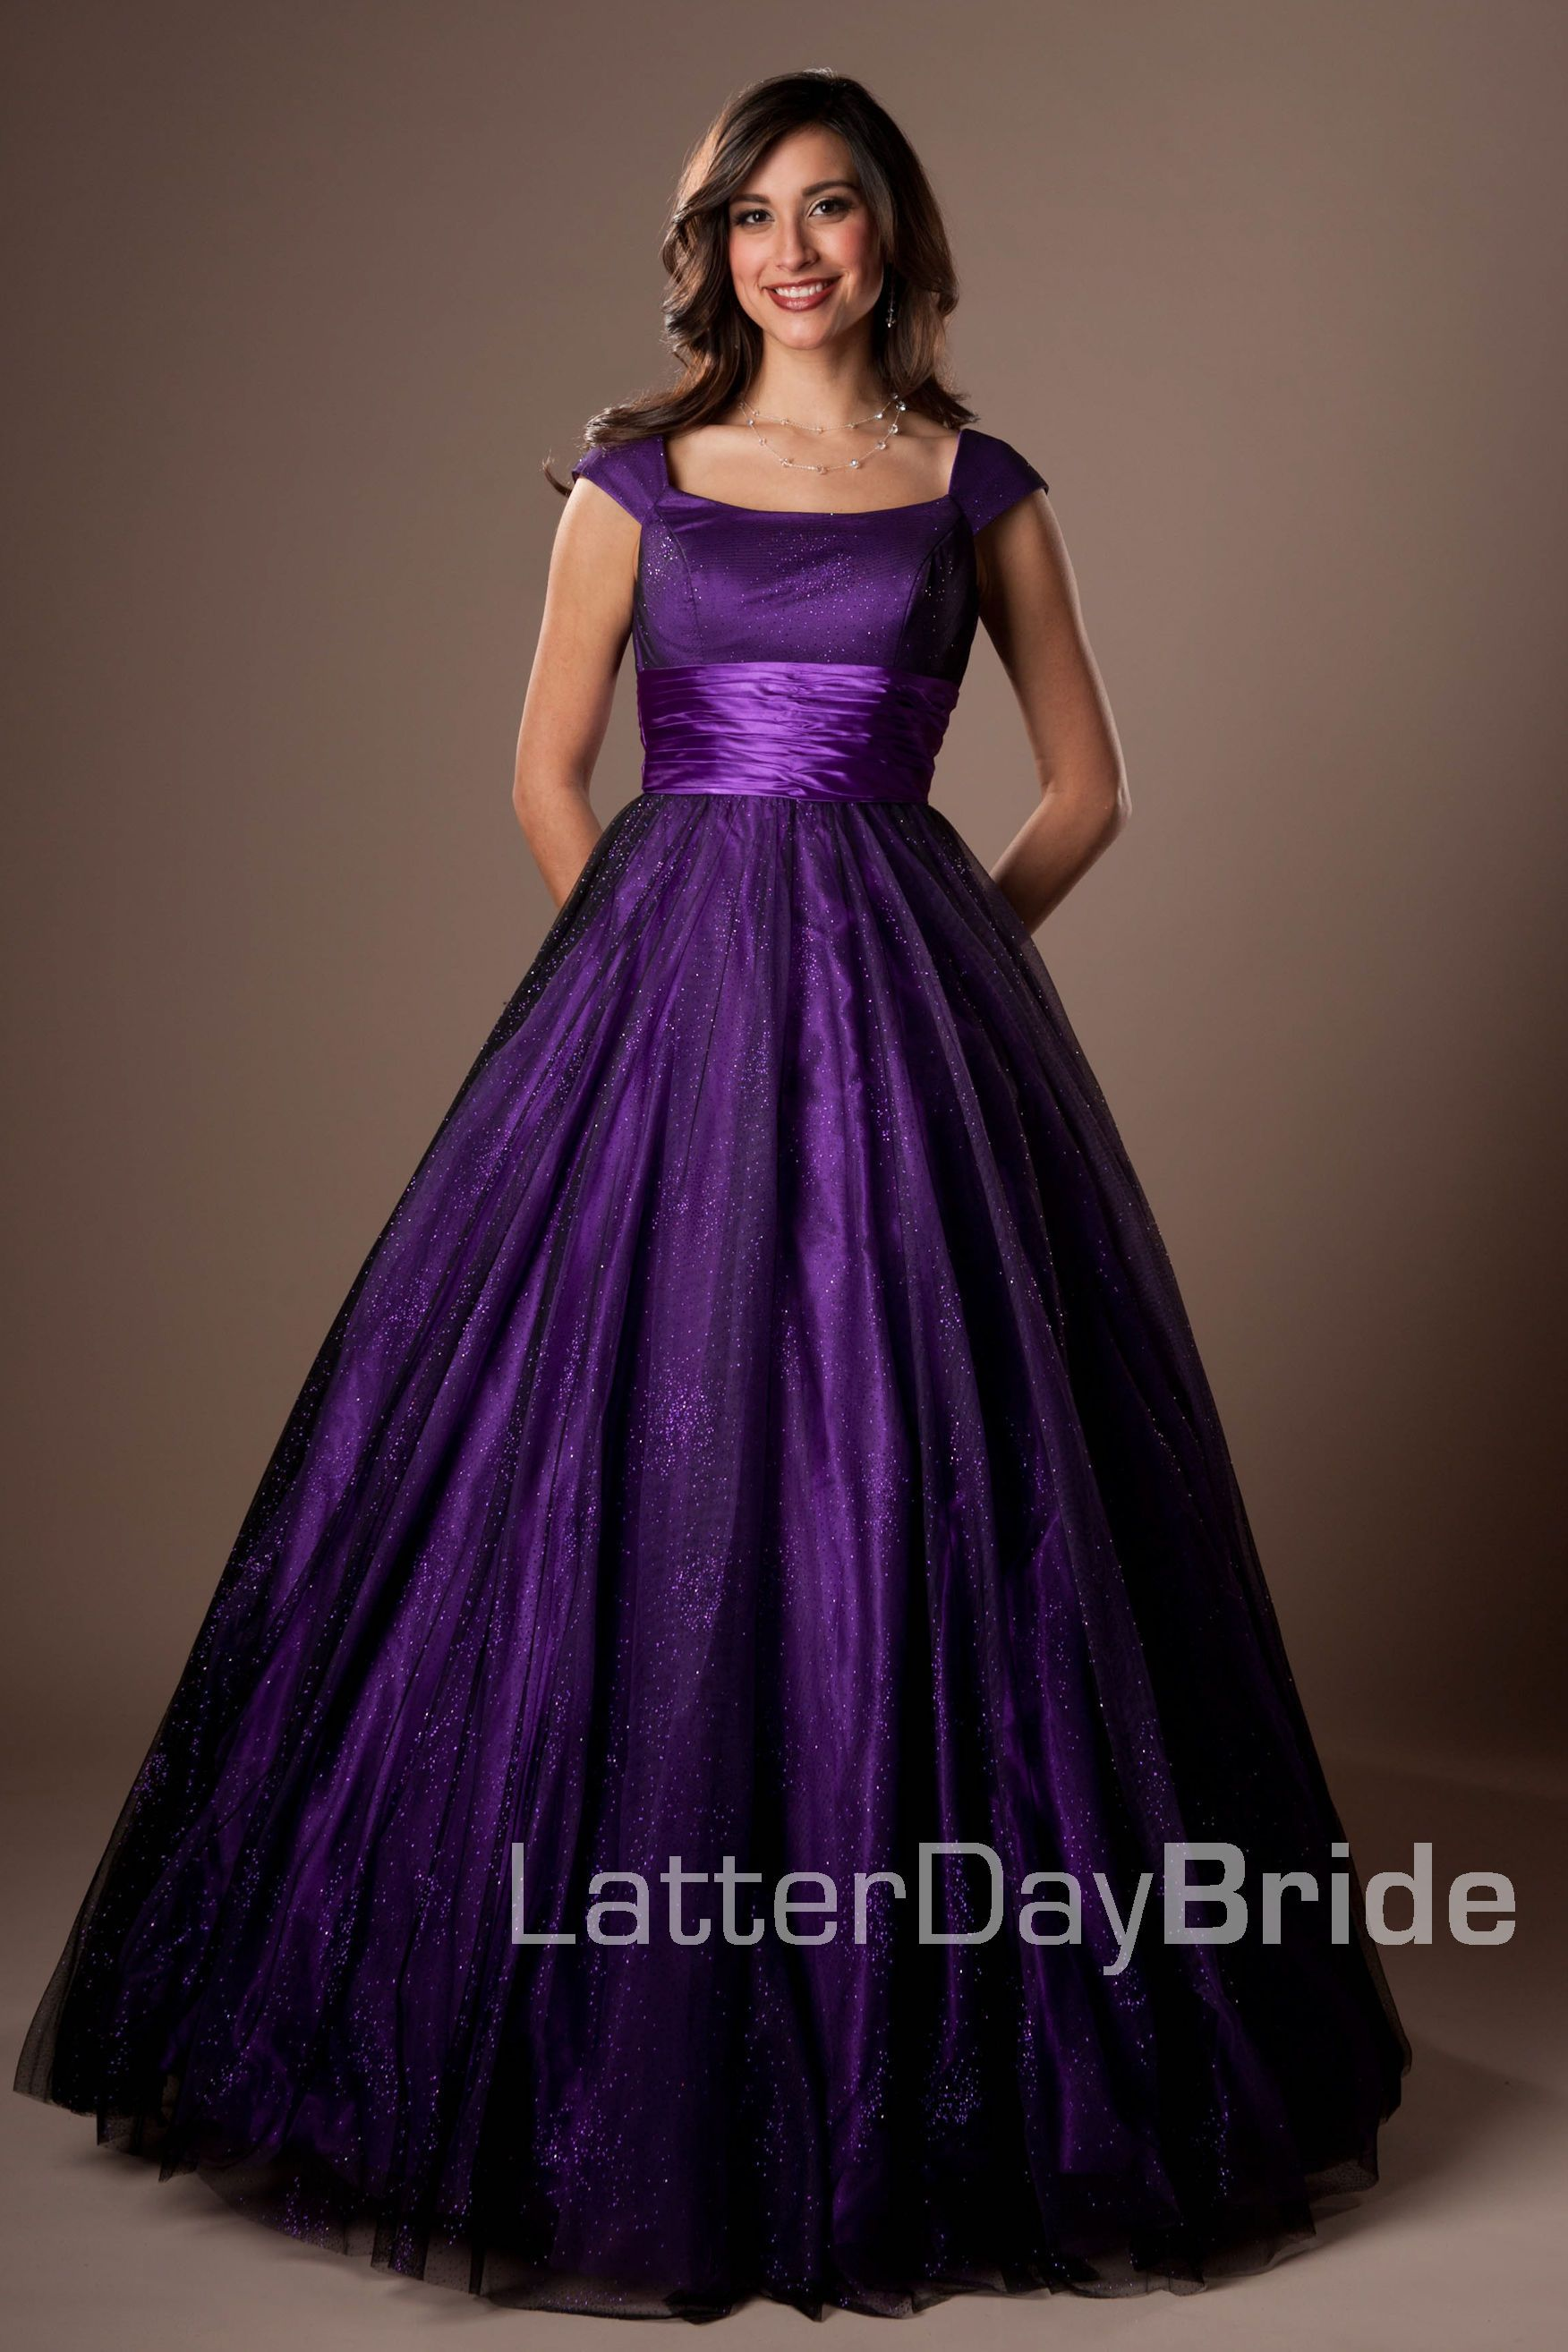 Bridesmaid Prom Gina Latterdaybride Prom Modest Mormon Lds Prom Dress Prom Dresses Modest Modest Dresses Modest Formal Dresses [ 2628 x 1752 Pixel ]